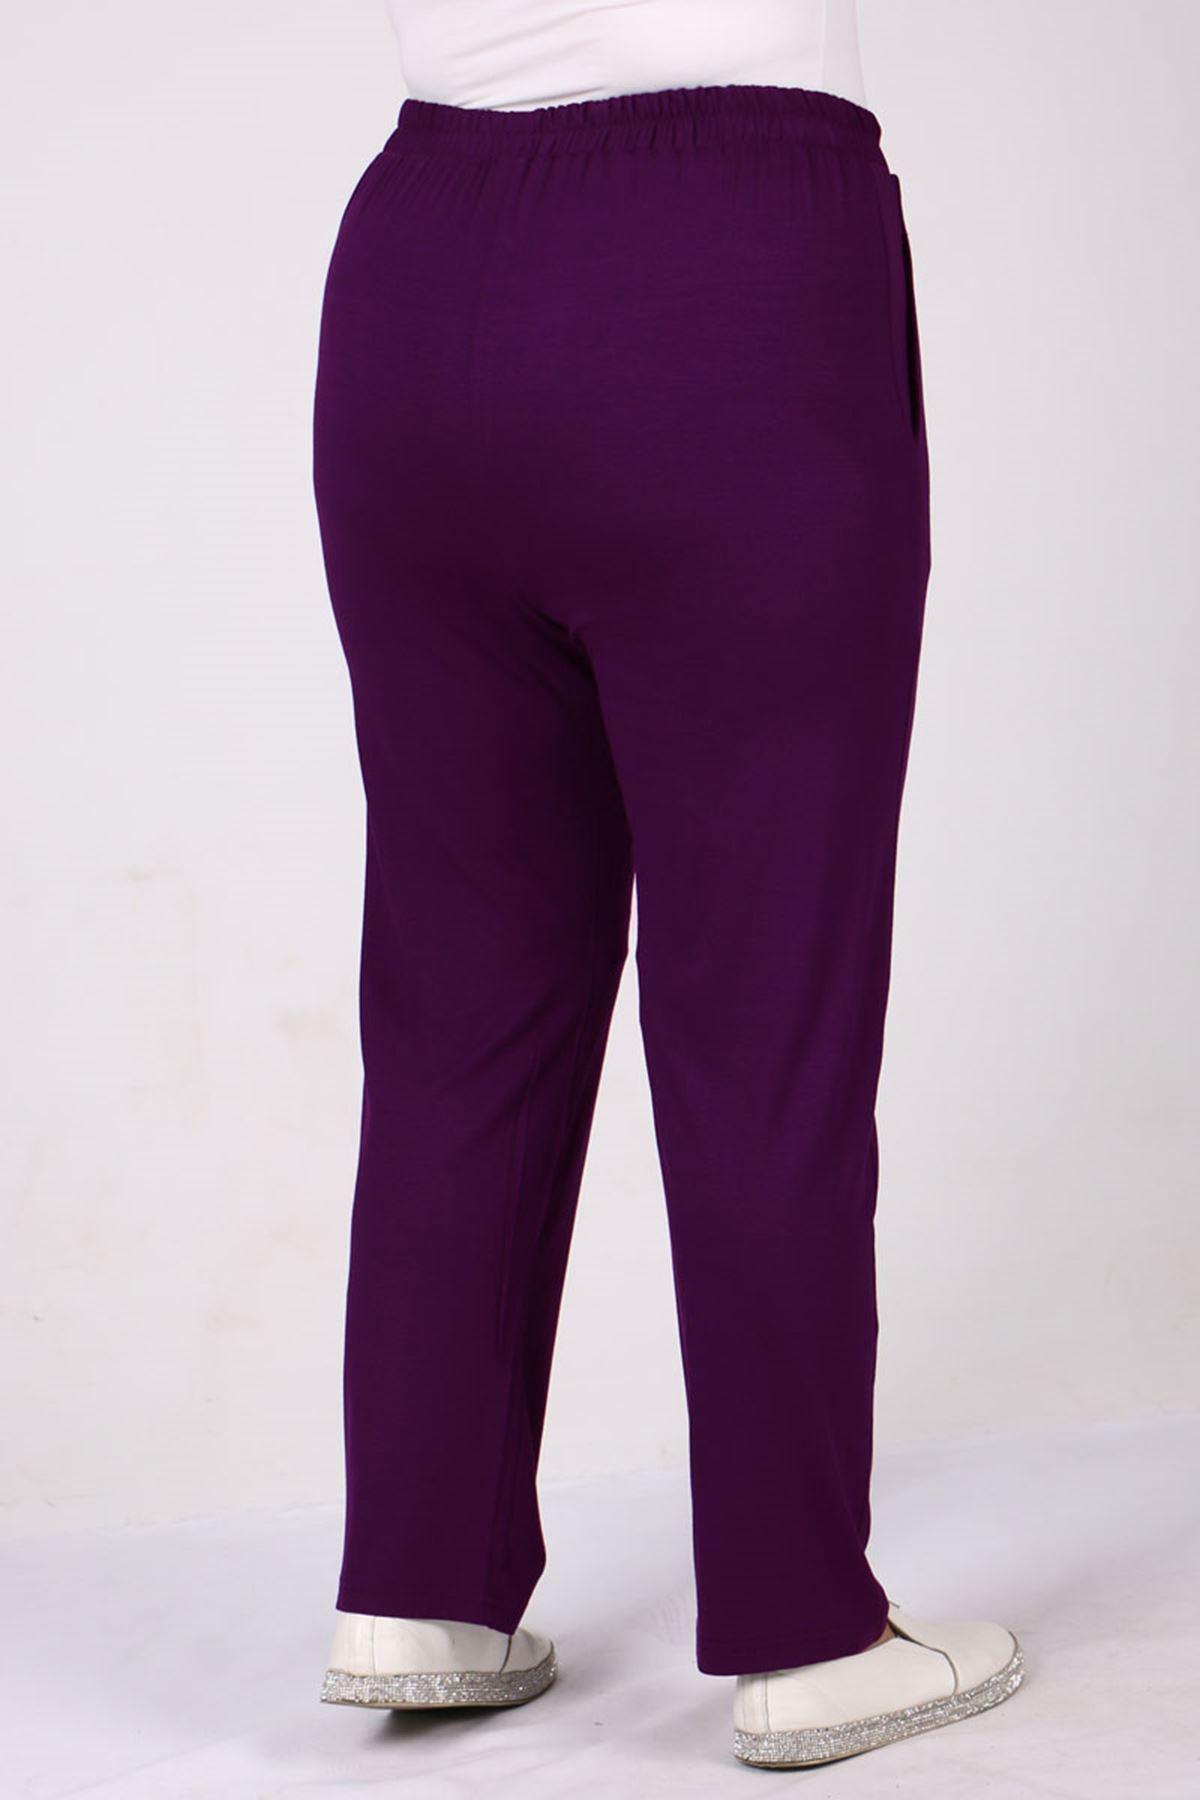 9160 Plus Size High Waist Elastic Pants - Purple